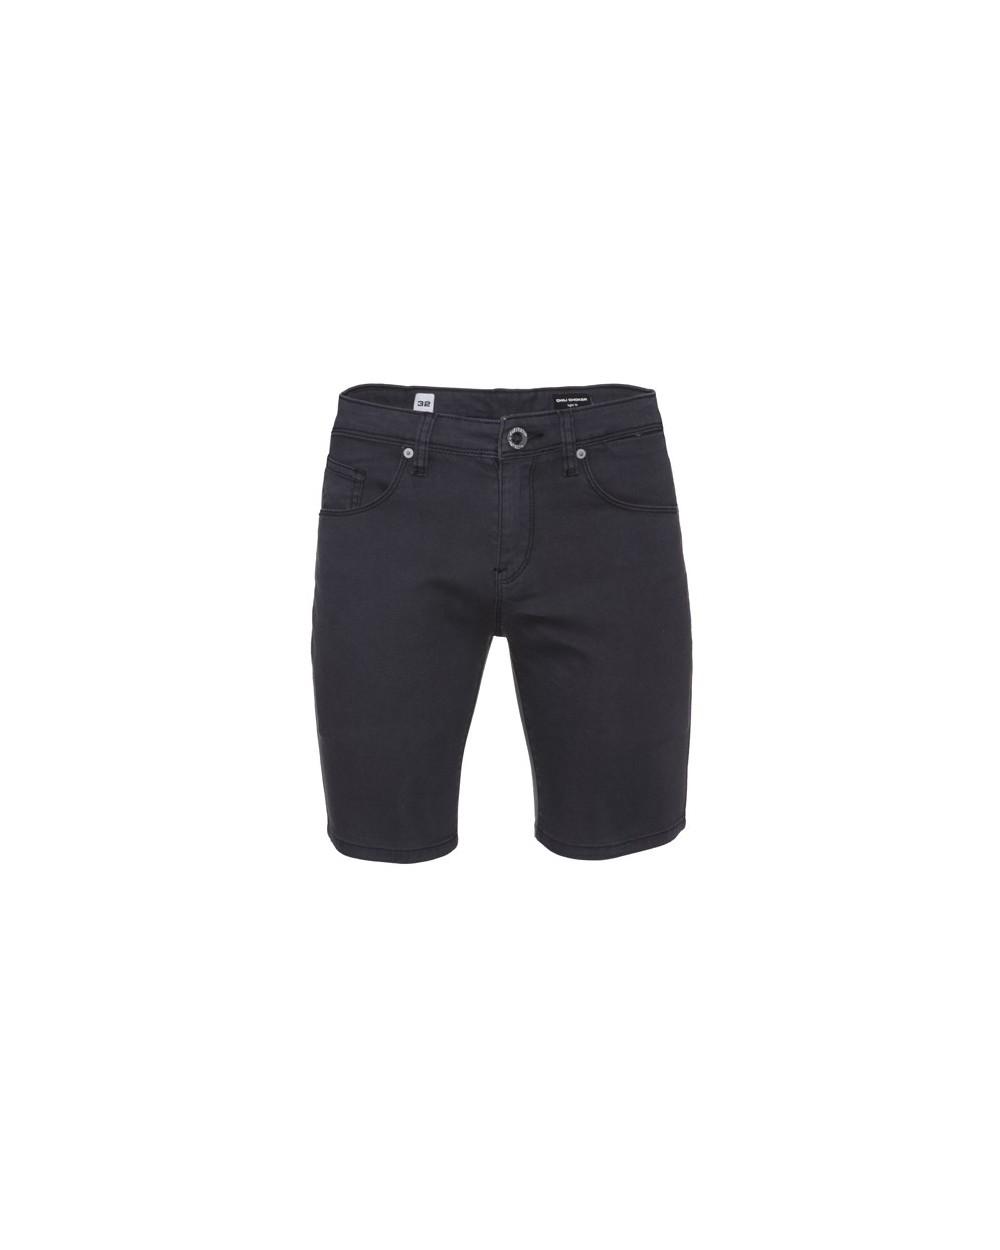 Volcom Chili Chocker Colored Shorts. (slf)